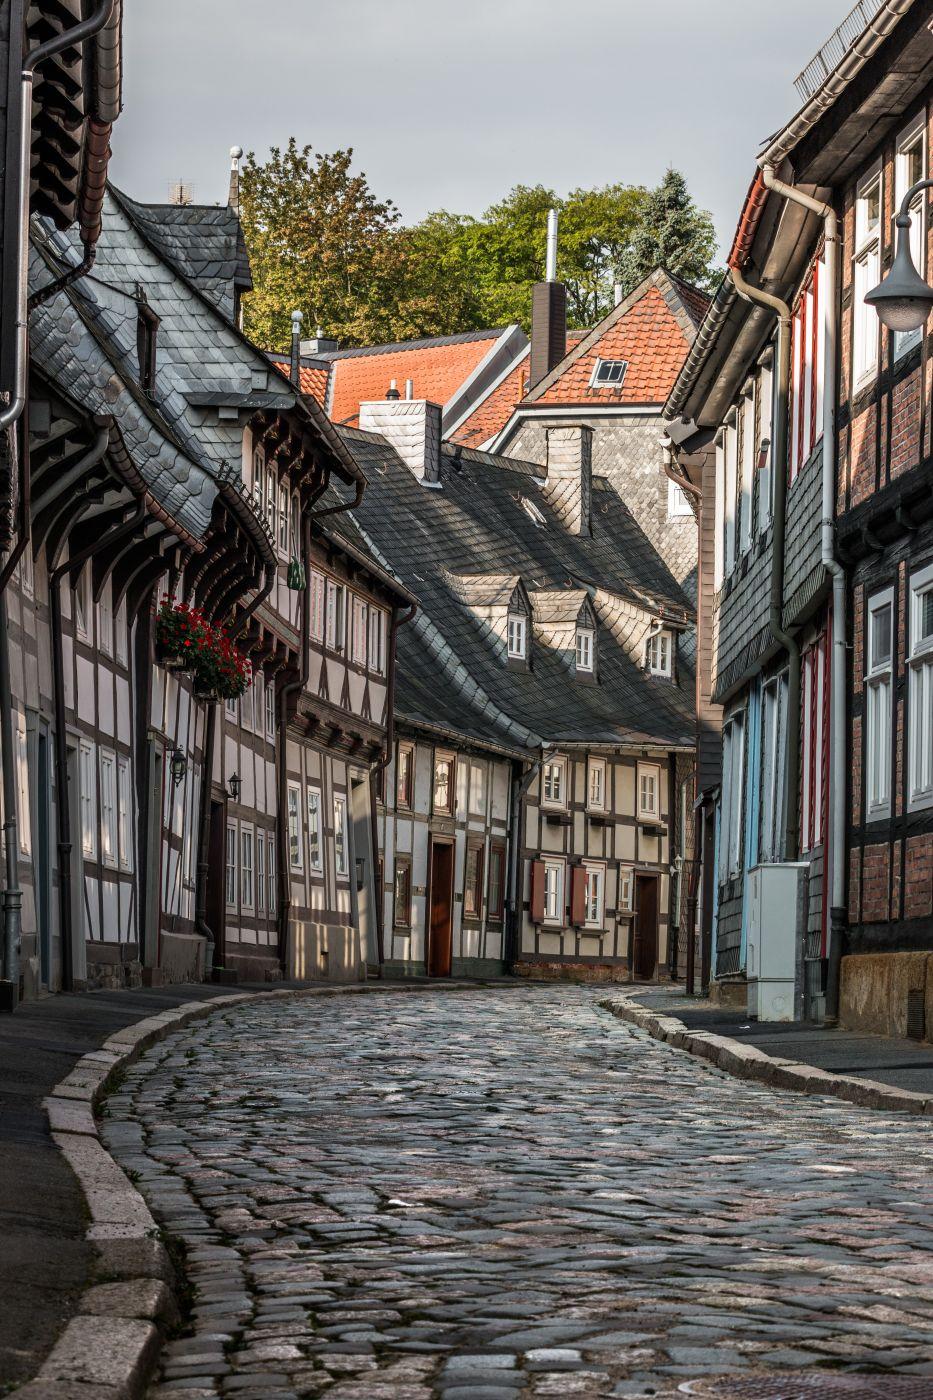 The streets of Goslar, Germany